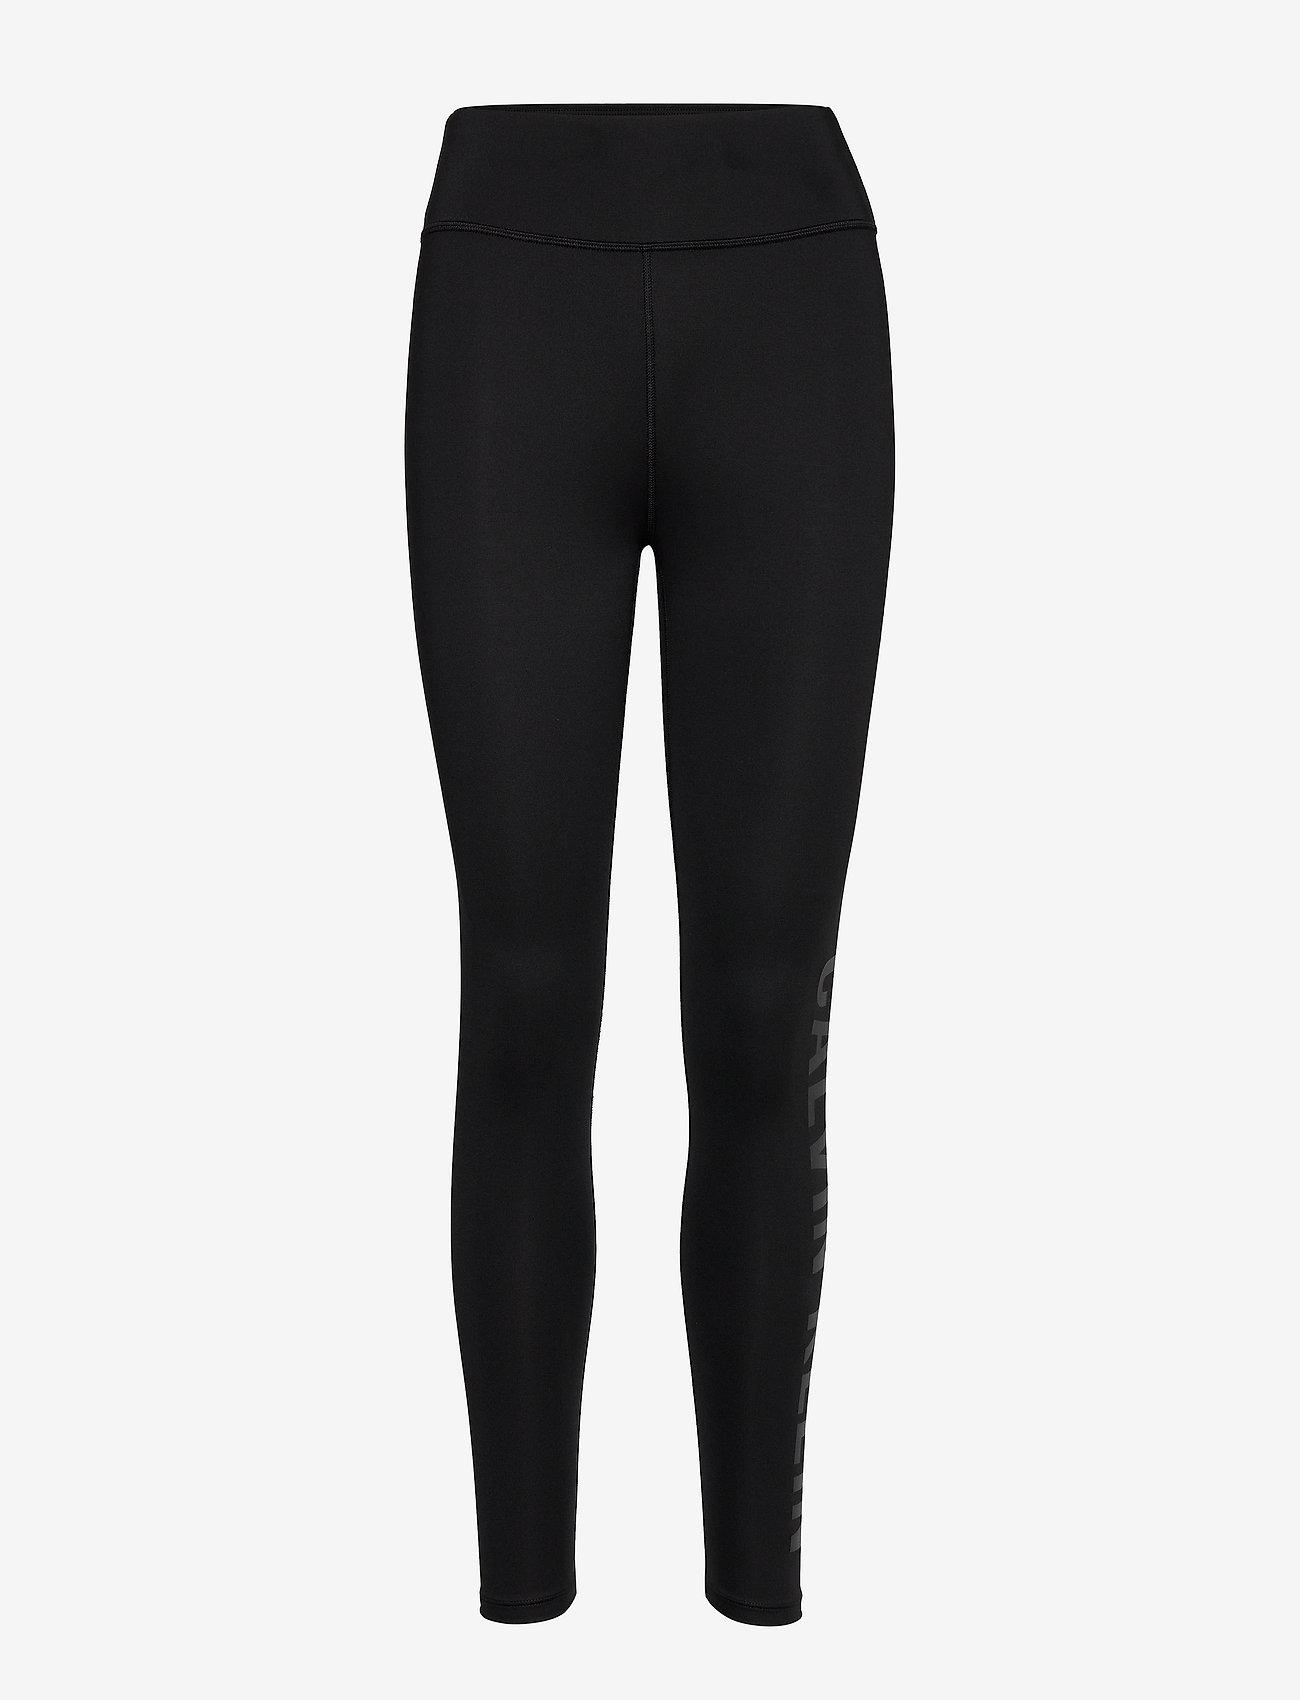 Calvin Klein Performance - FULL LENGTH TIGHT - running & training tights - ck black - 0